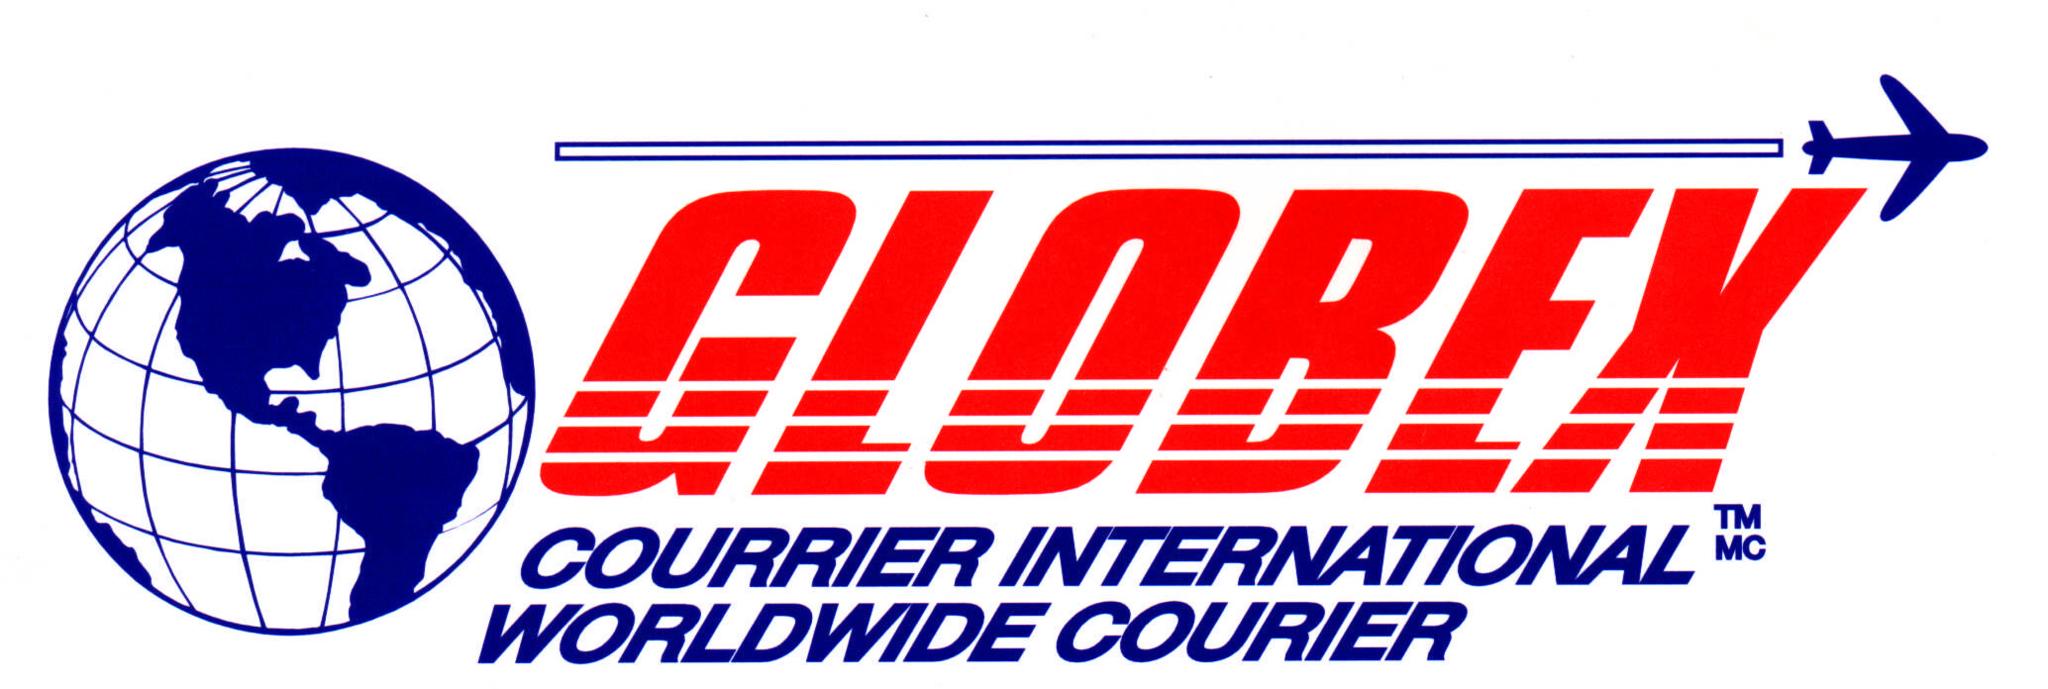 Globex Courrier Express International in Saint-Laurent